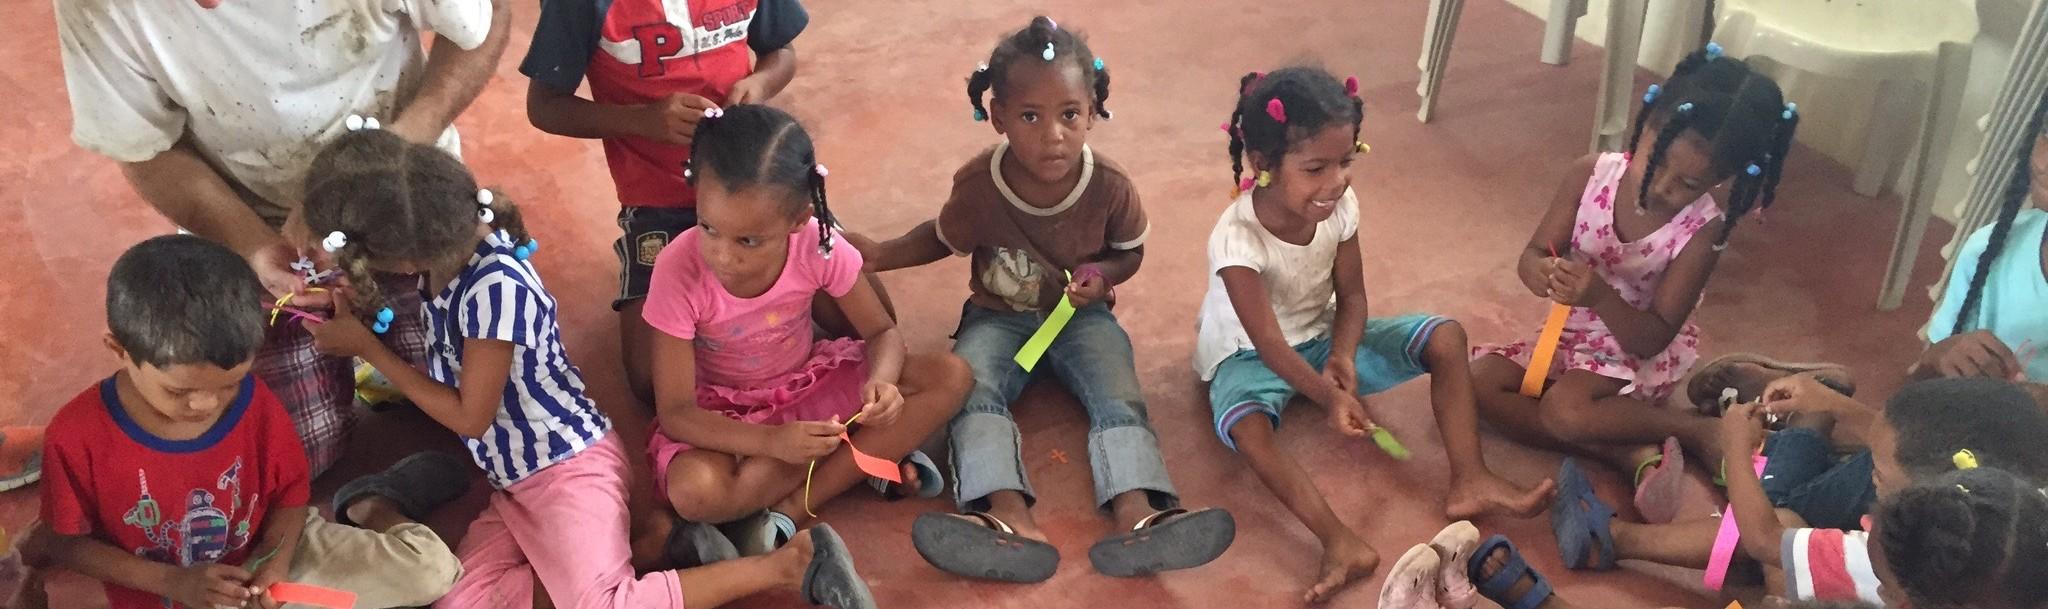 Dominican Republic, September 12th -18th, 2015; Trip Update 4